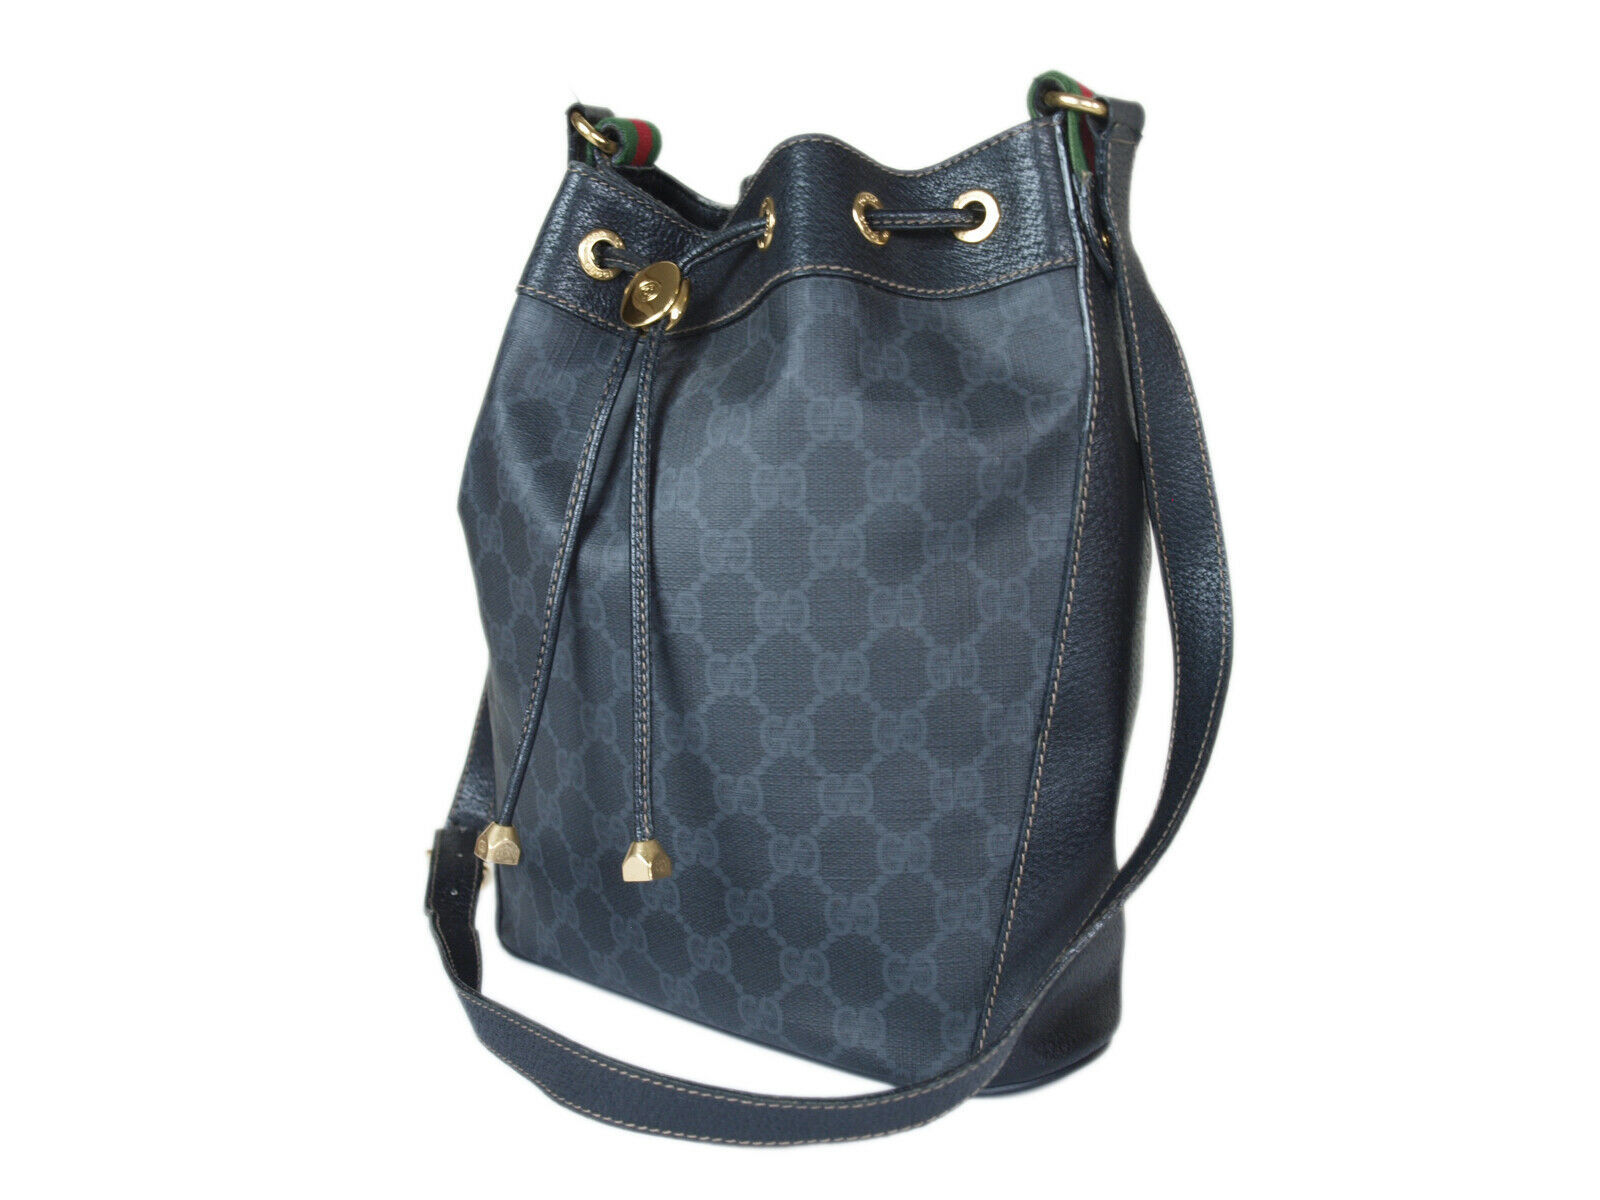 Auth GUCCI GG Web PVC Canvas Leather Black Drawstring Shoulder Bag GS2129